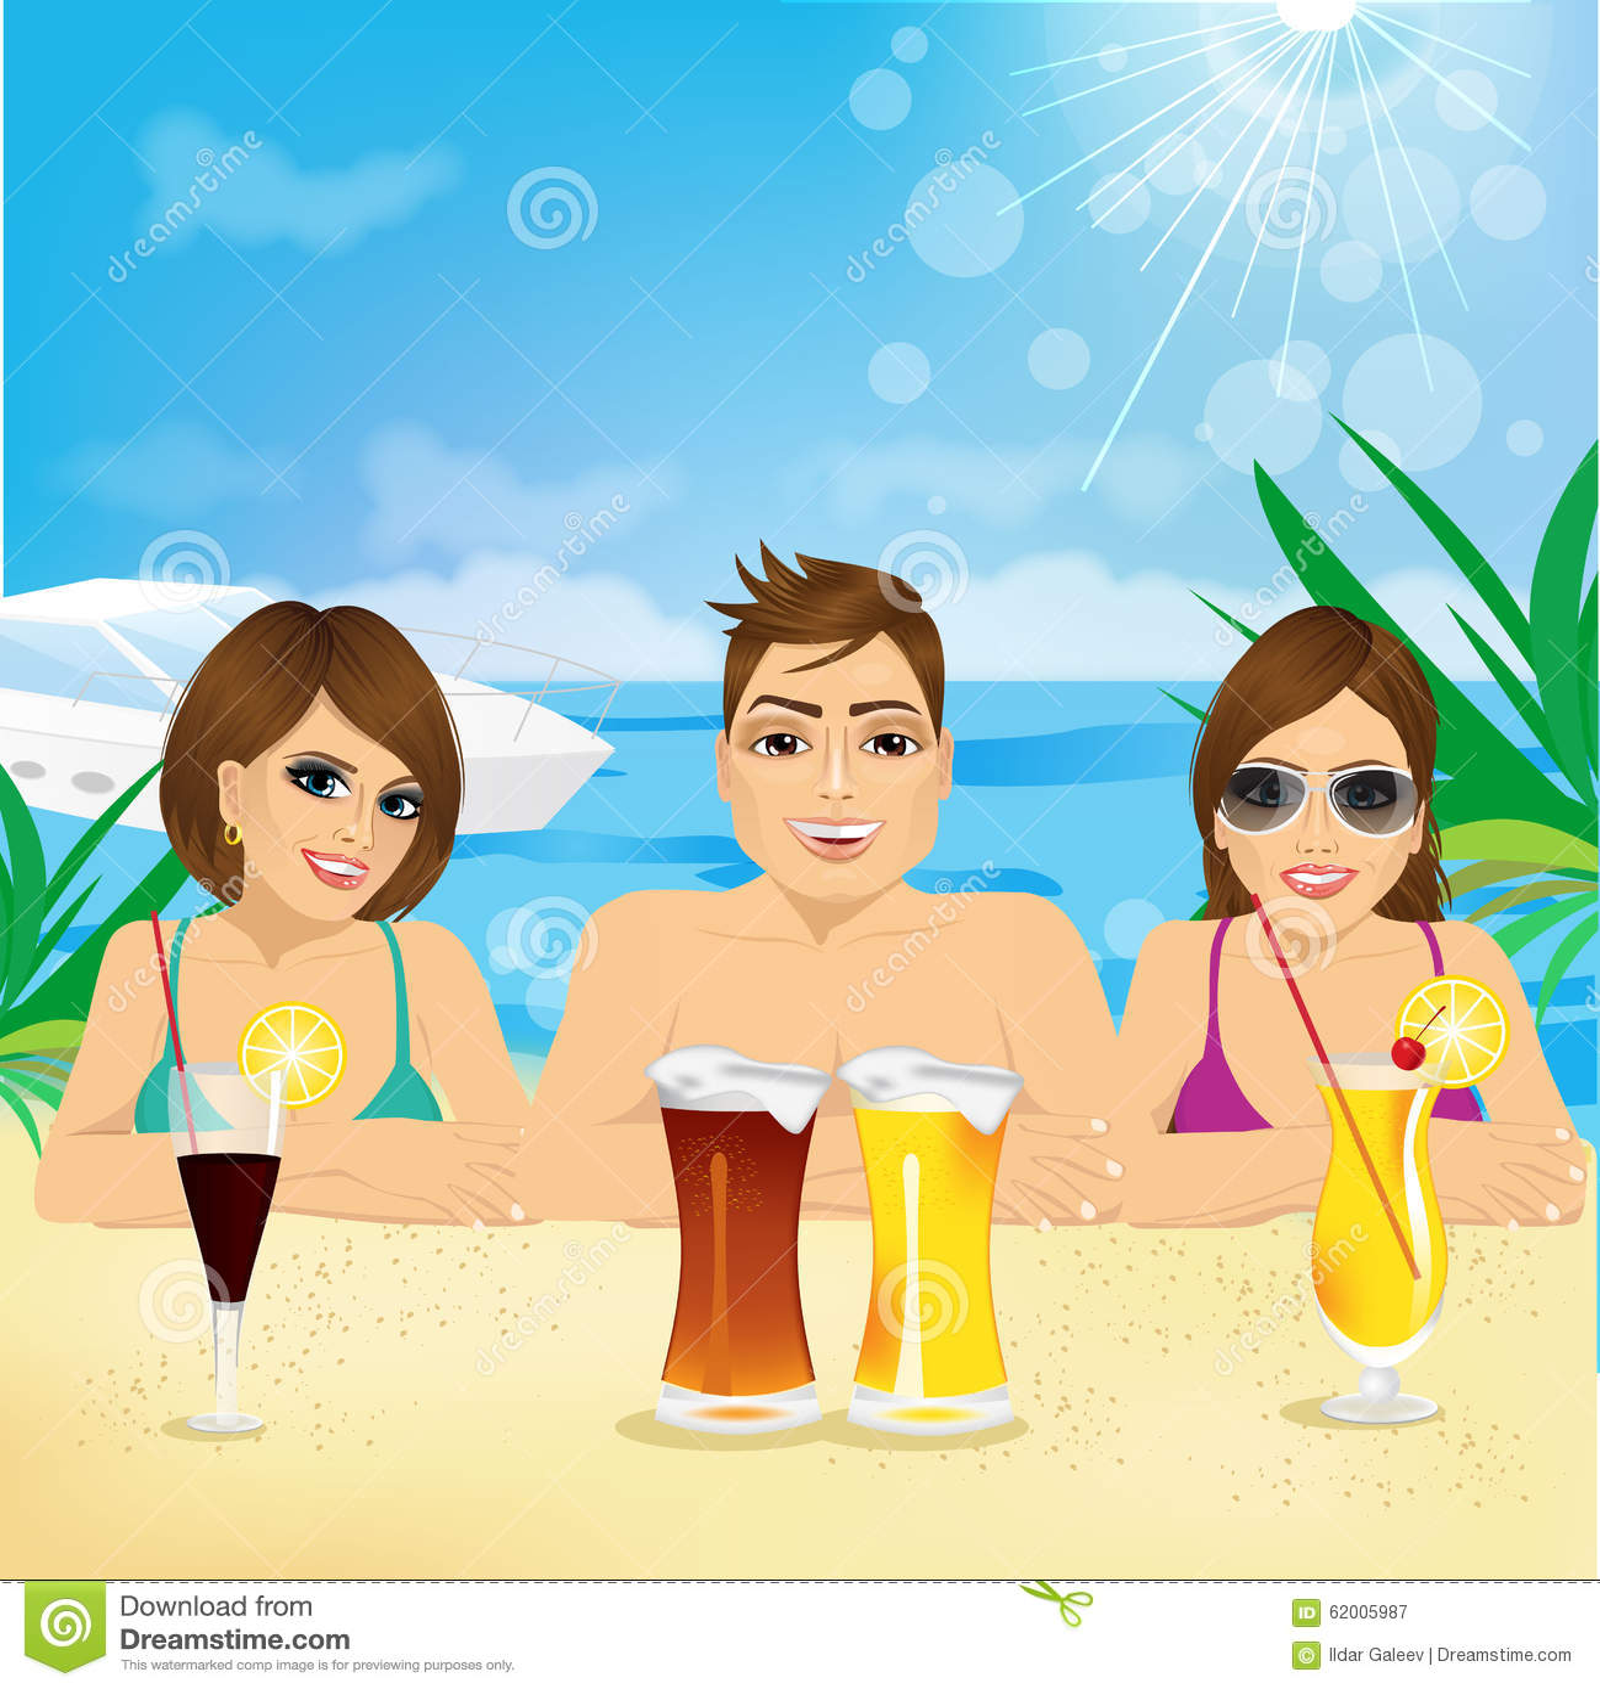 Woman Enjoying At Beach Stock Image Image Of Pleasure: Man And Two Woman Enjoying Beach Holiday Stock Vector